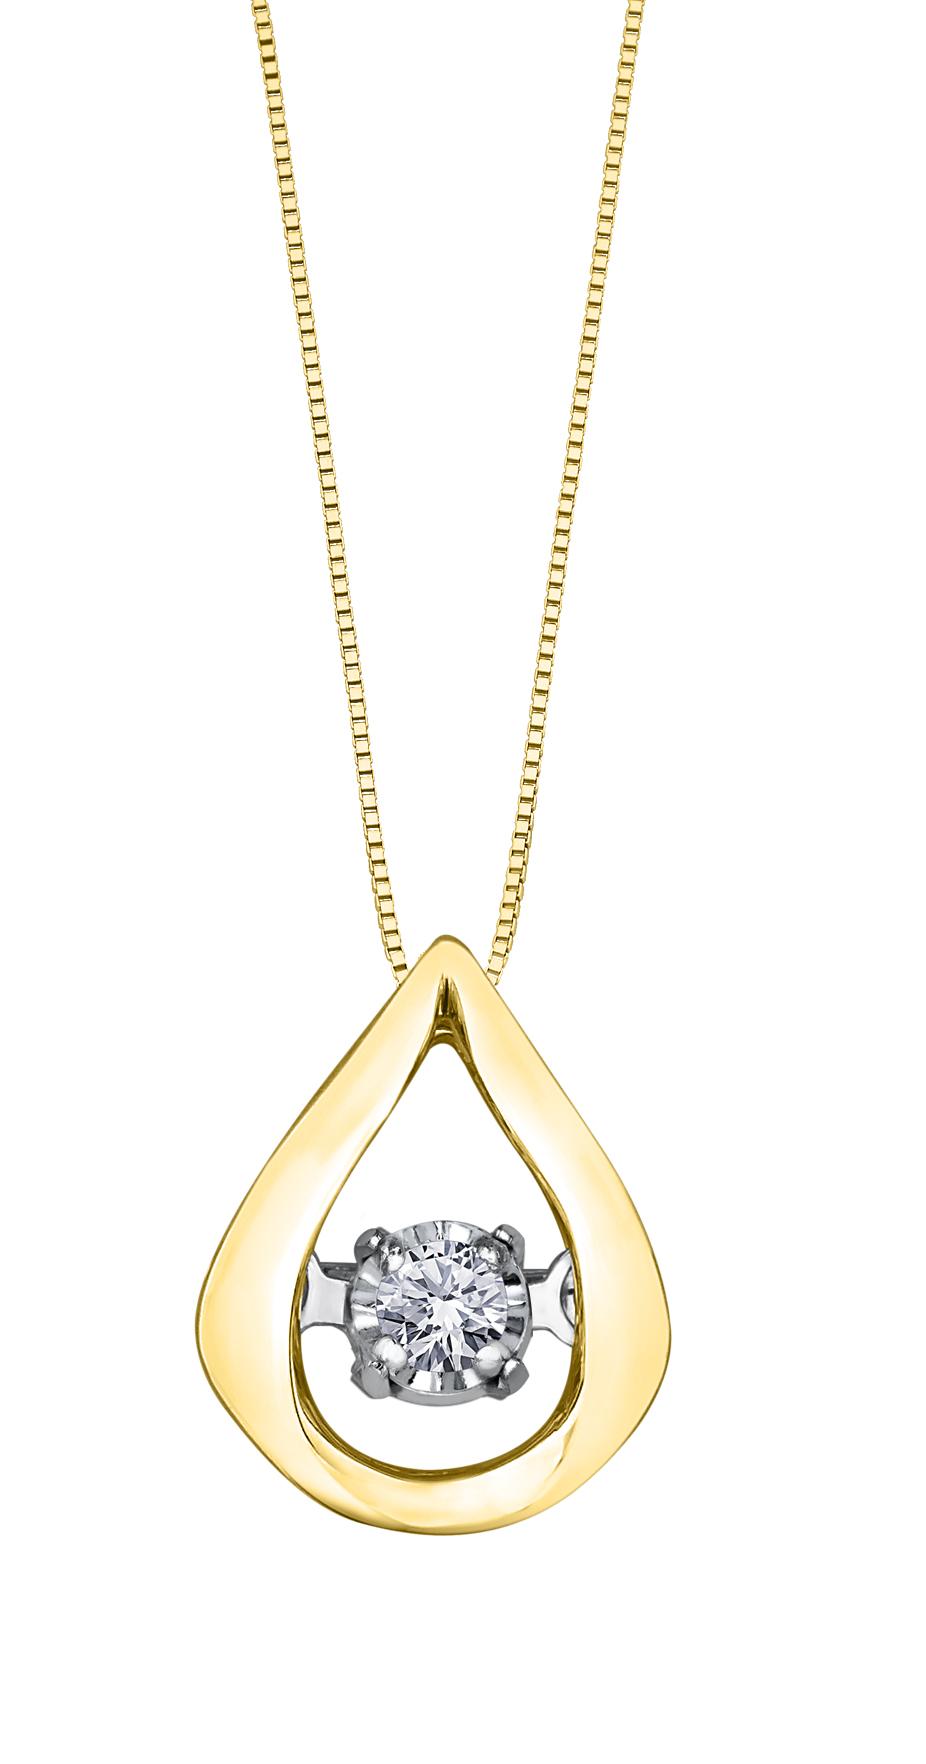 Éclat du Nord Dancing Diamond Pendant - 10K yellow gold & Canadian diamond